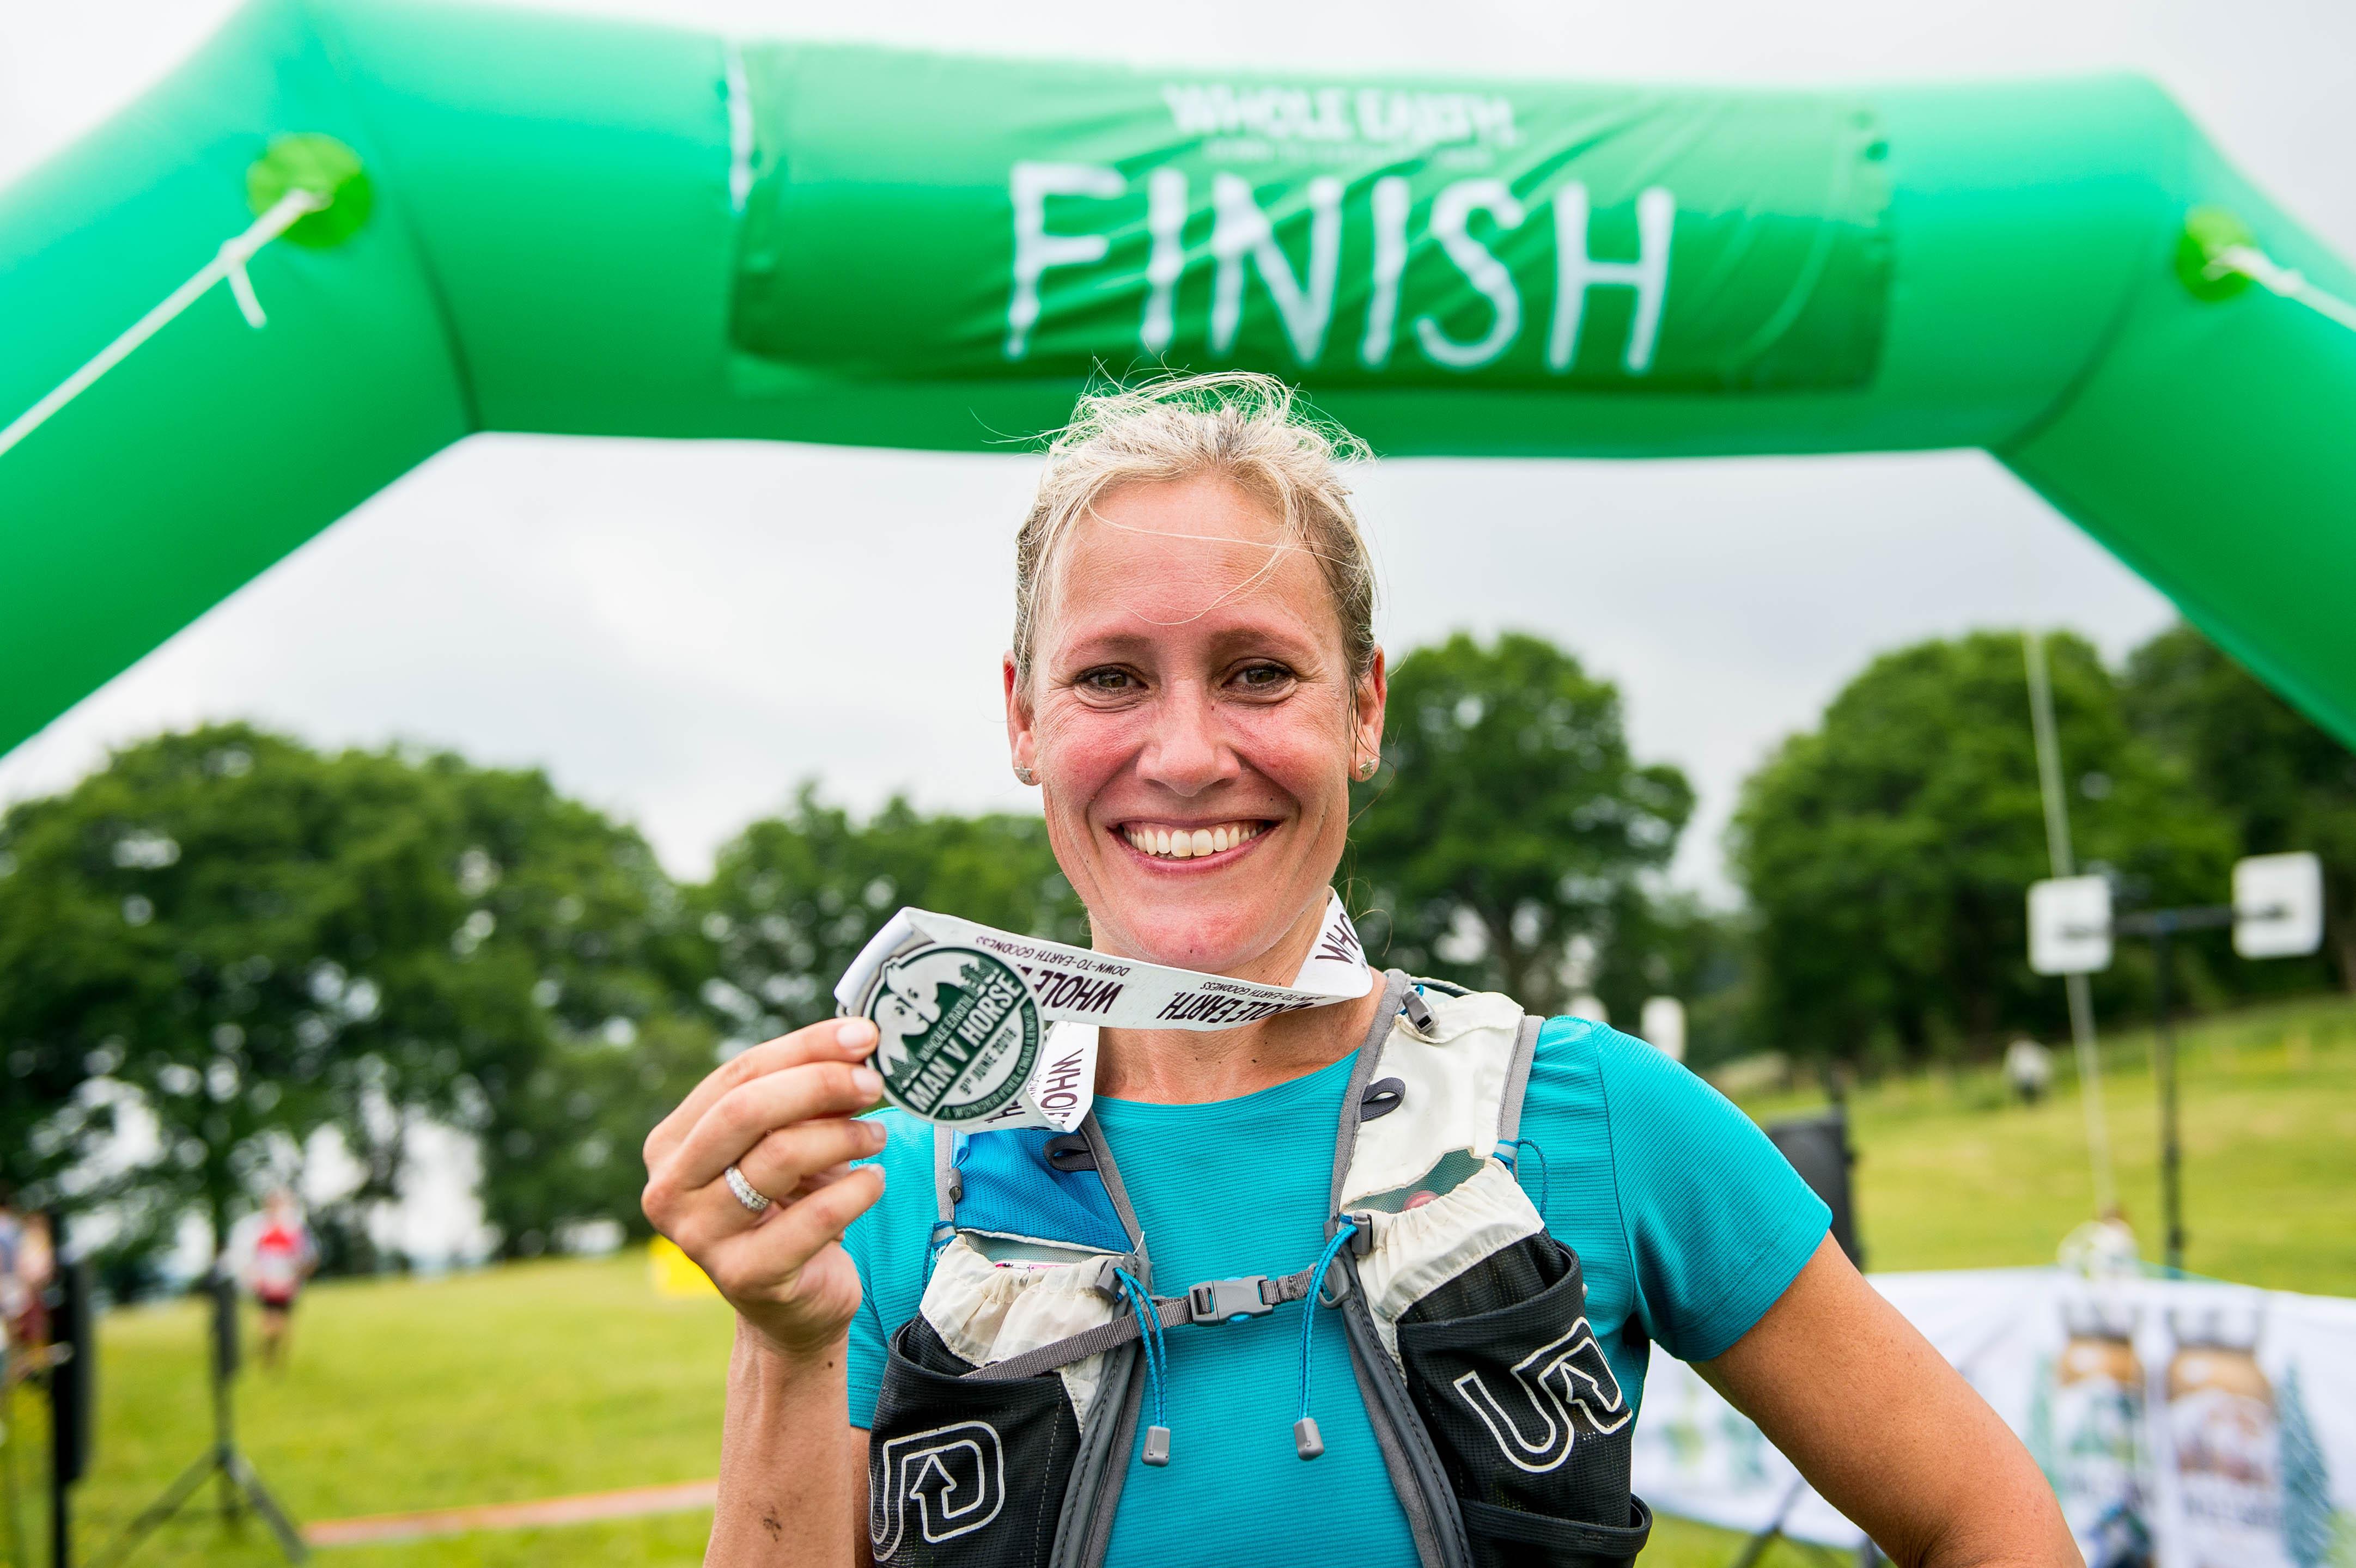 Sophie with medal finish line.jpg